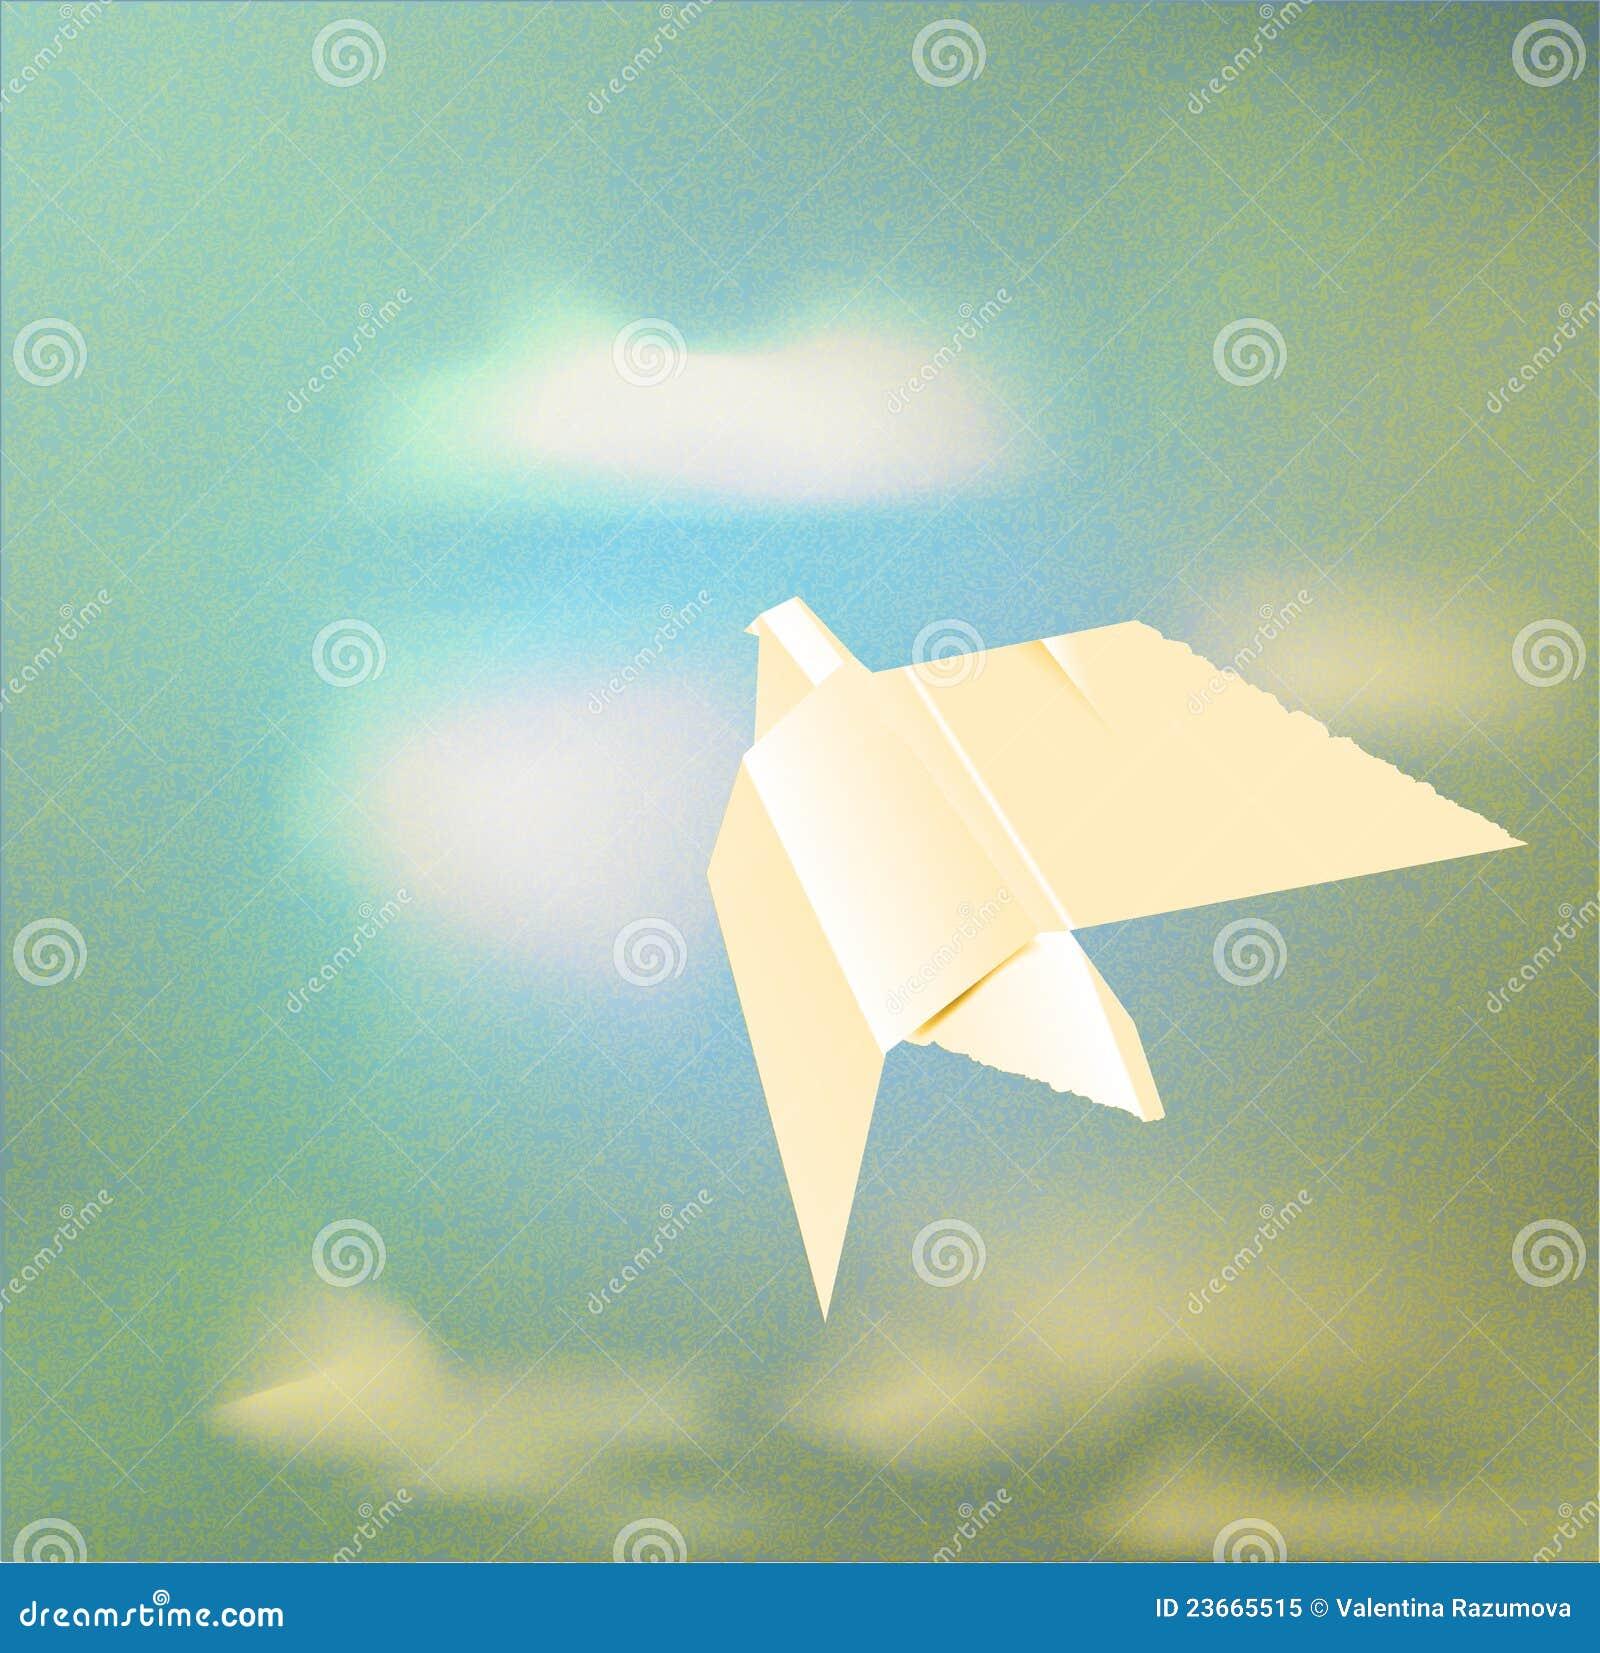 Paper Origami Dove Royalty Free Stock Photo - Image: 23665515 - photo#31